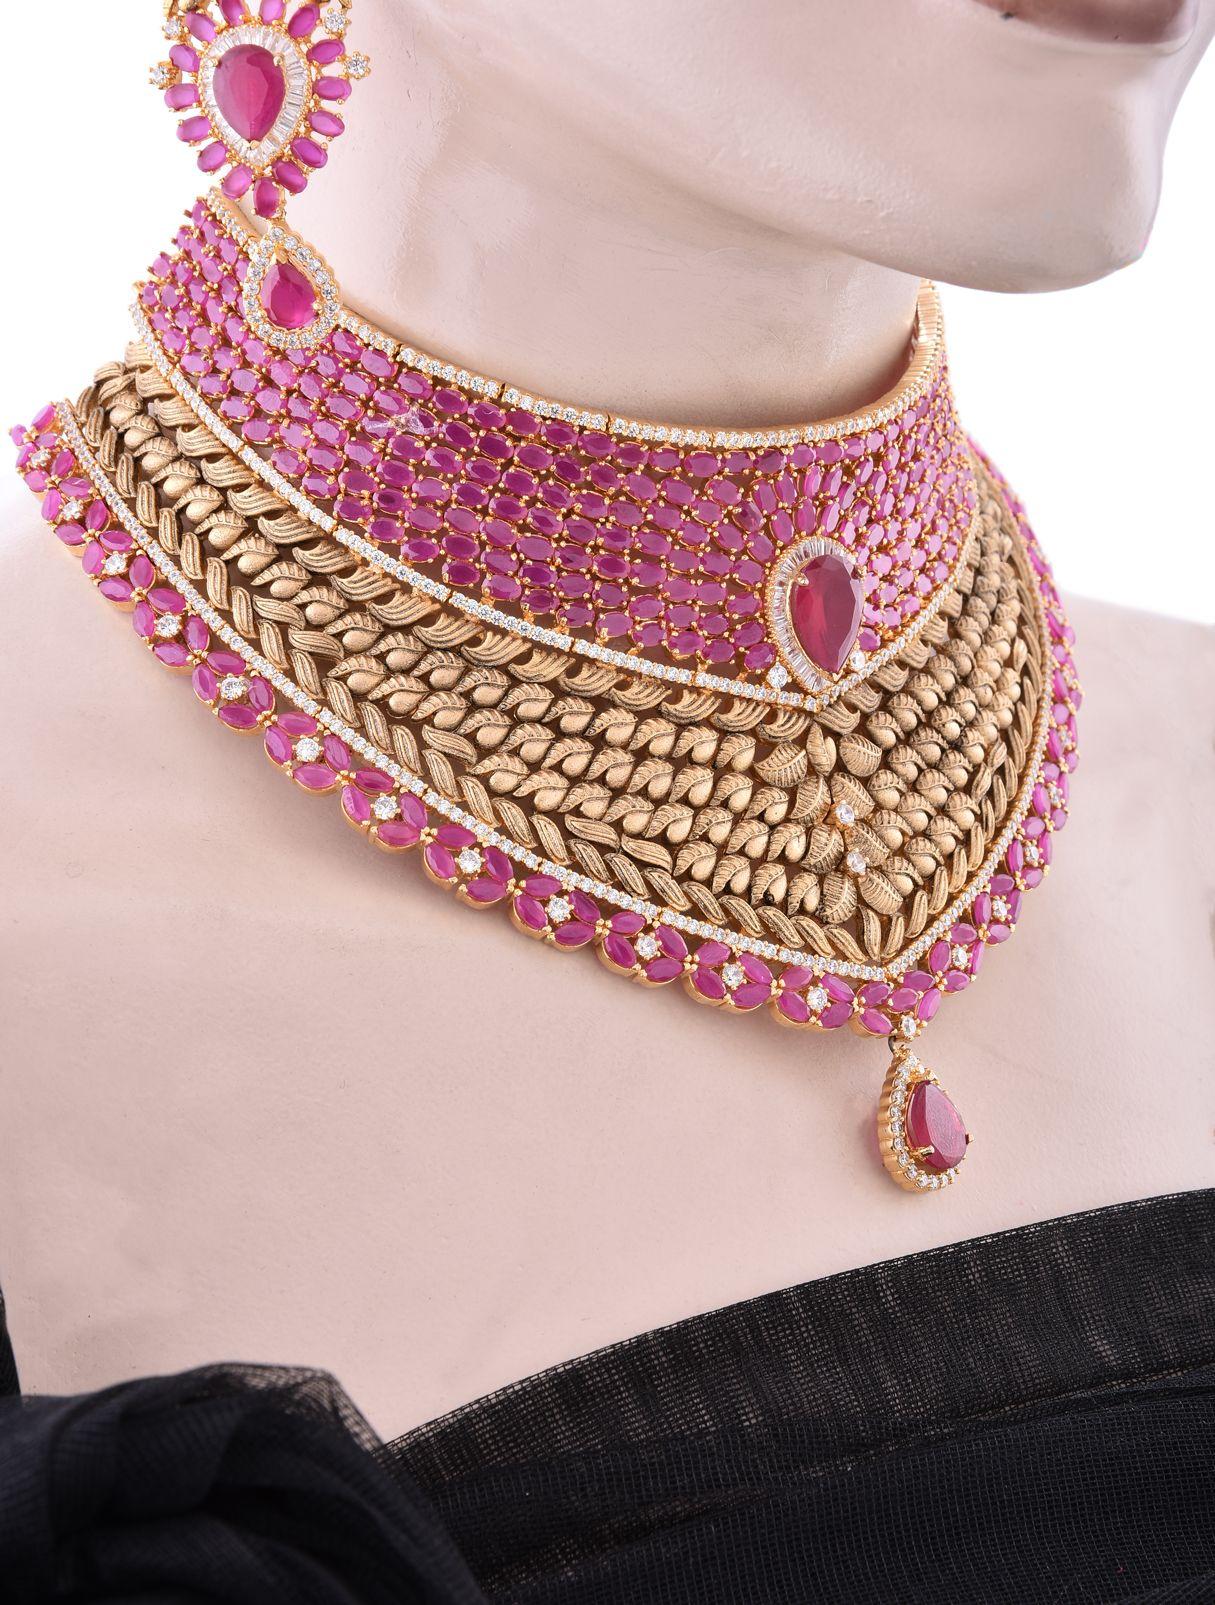 Grand Choker Set for Wedding Reception | Indian Bridal Jewelry ...